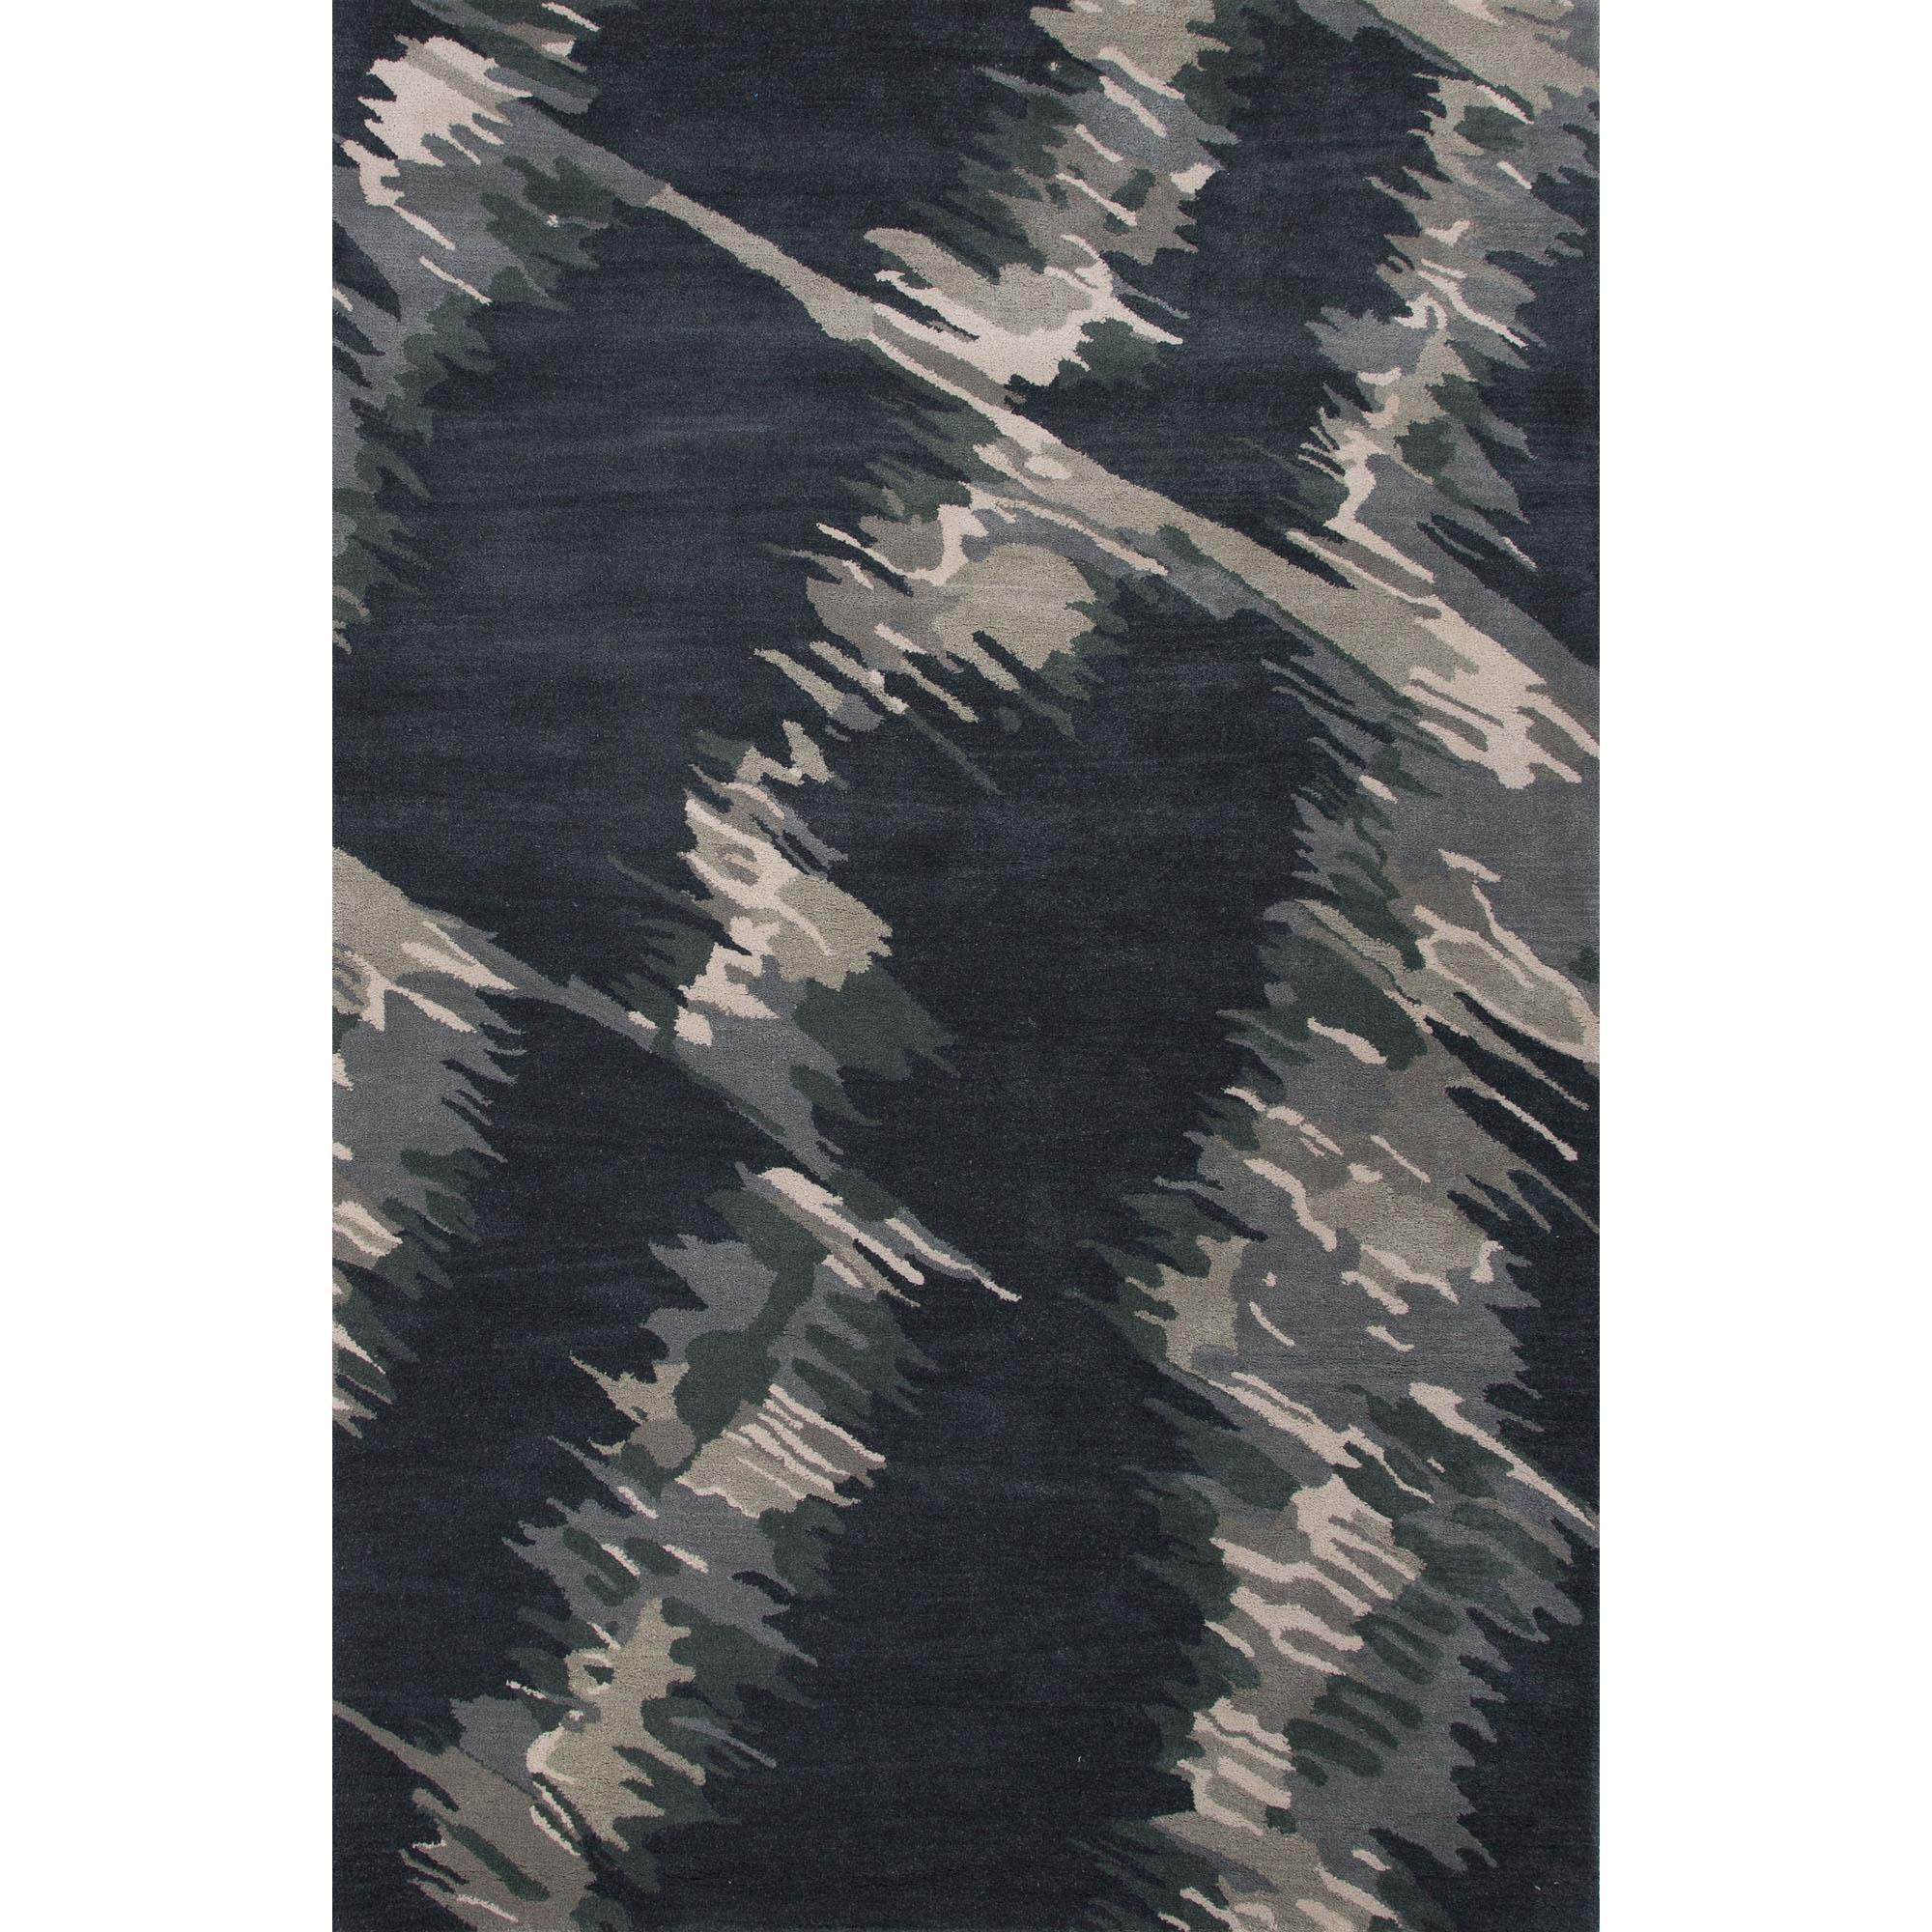 JAIPUR Rugs En Casa By Luli Sanchez Tufted 5 x 8 Rug - Item Number: RUG115635